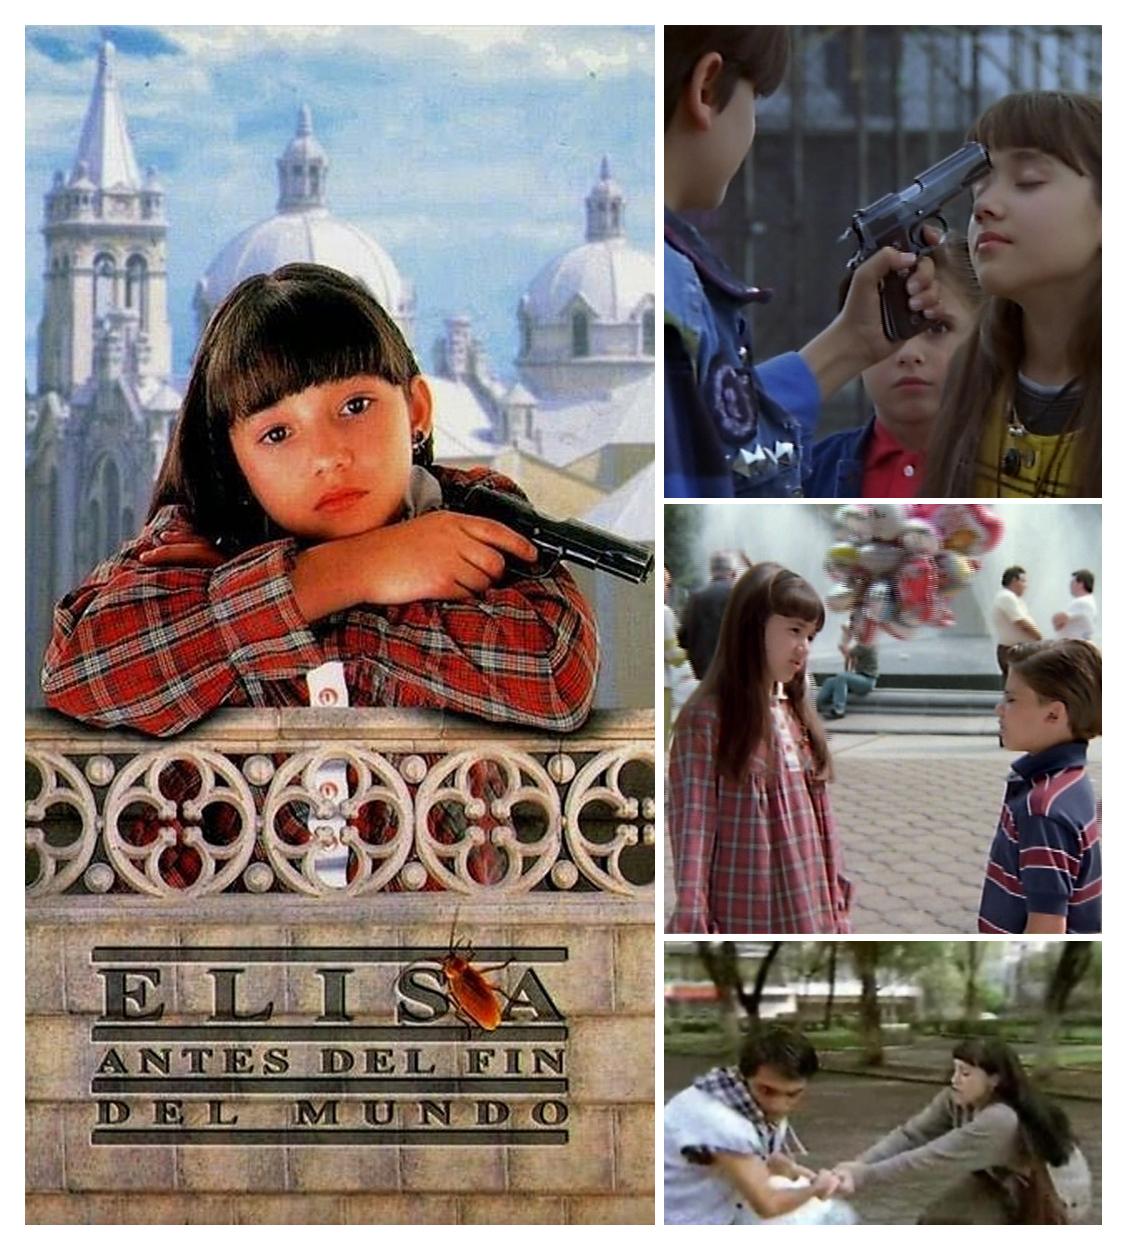 http://images.vfl.ru/ii/1606922652/0f733569/32524659.jpg